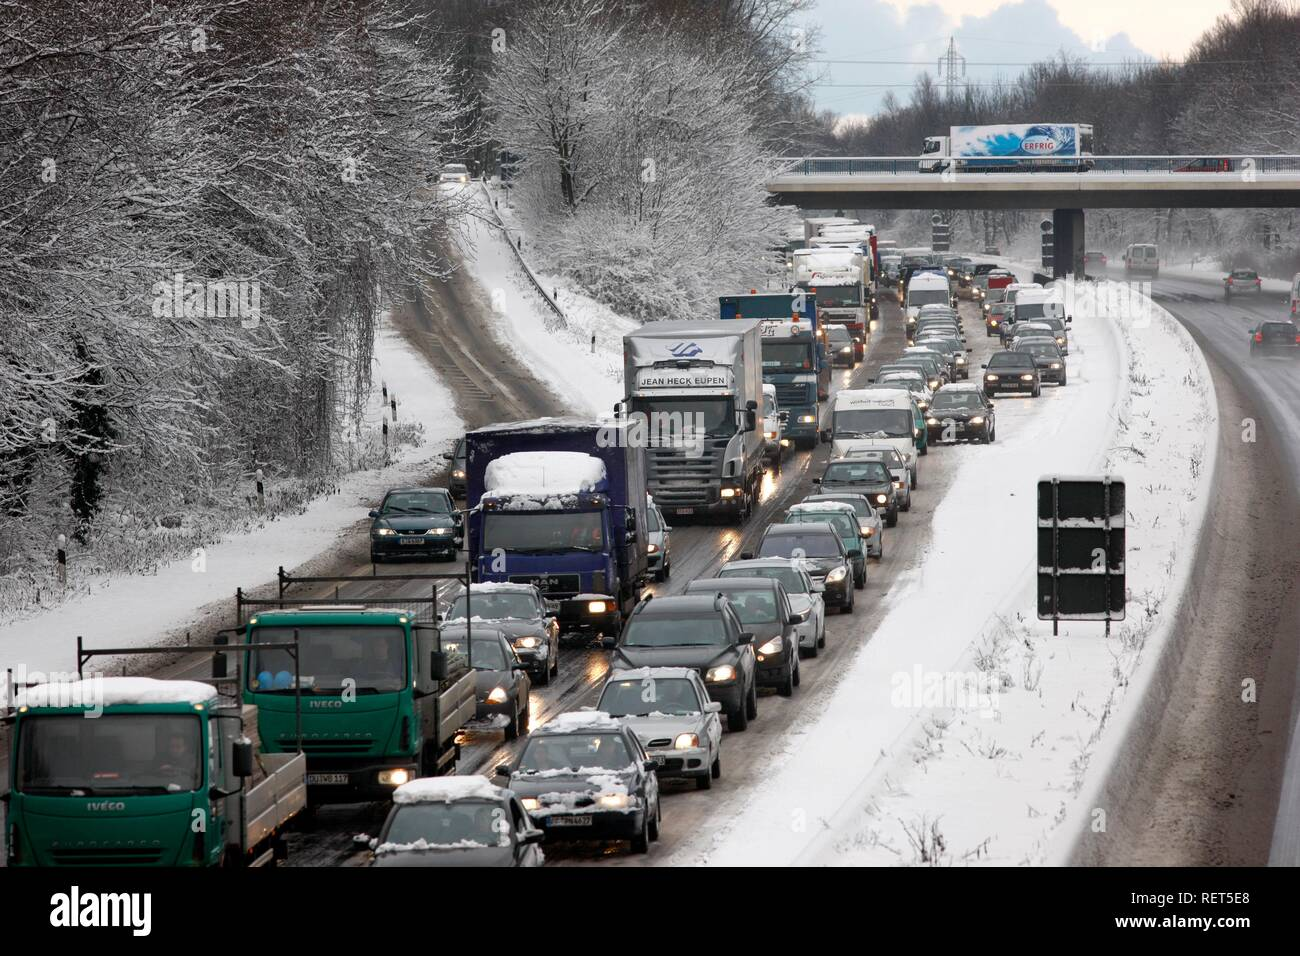 Traffic jam after heavy snow fall, motorway Autobahn A40, Ruhr expressway between Duisburg and Essen, near Muelheim - Stock Image